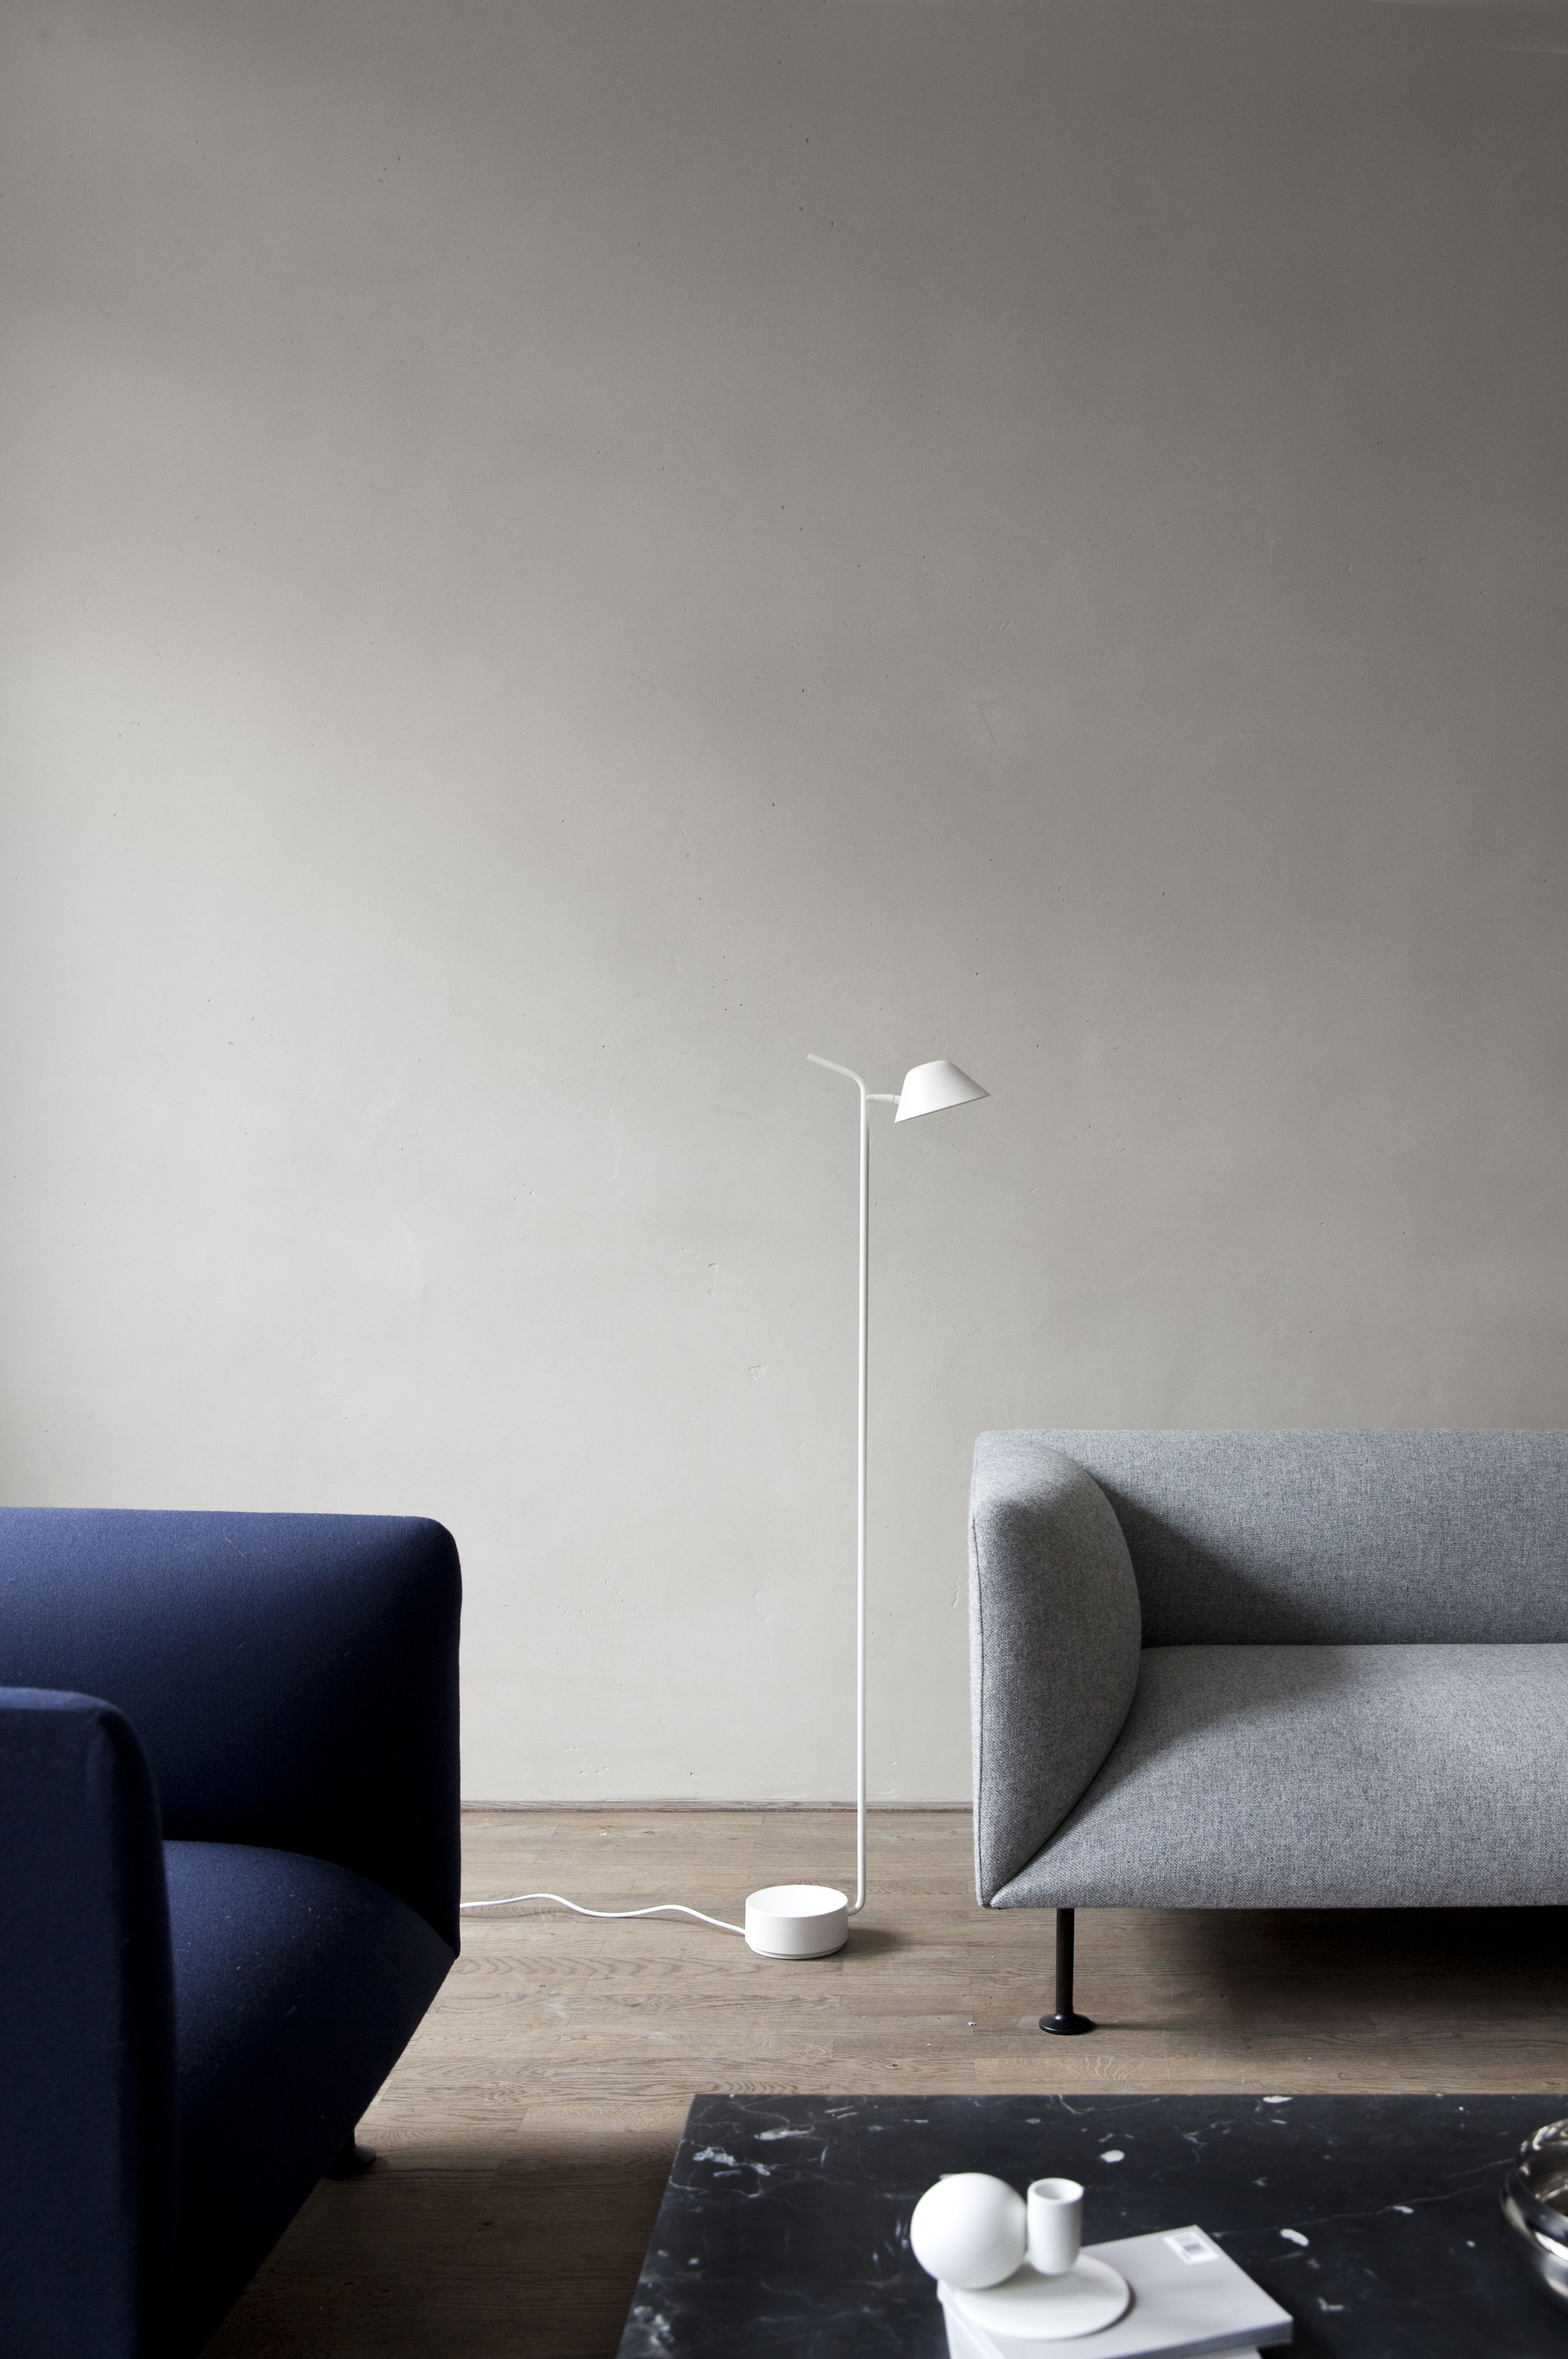 Floor Tables Menu Gotot Sofa Plinth Marble Table Peek Floor Lamp Menu